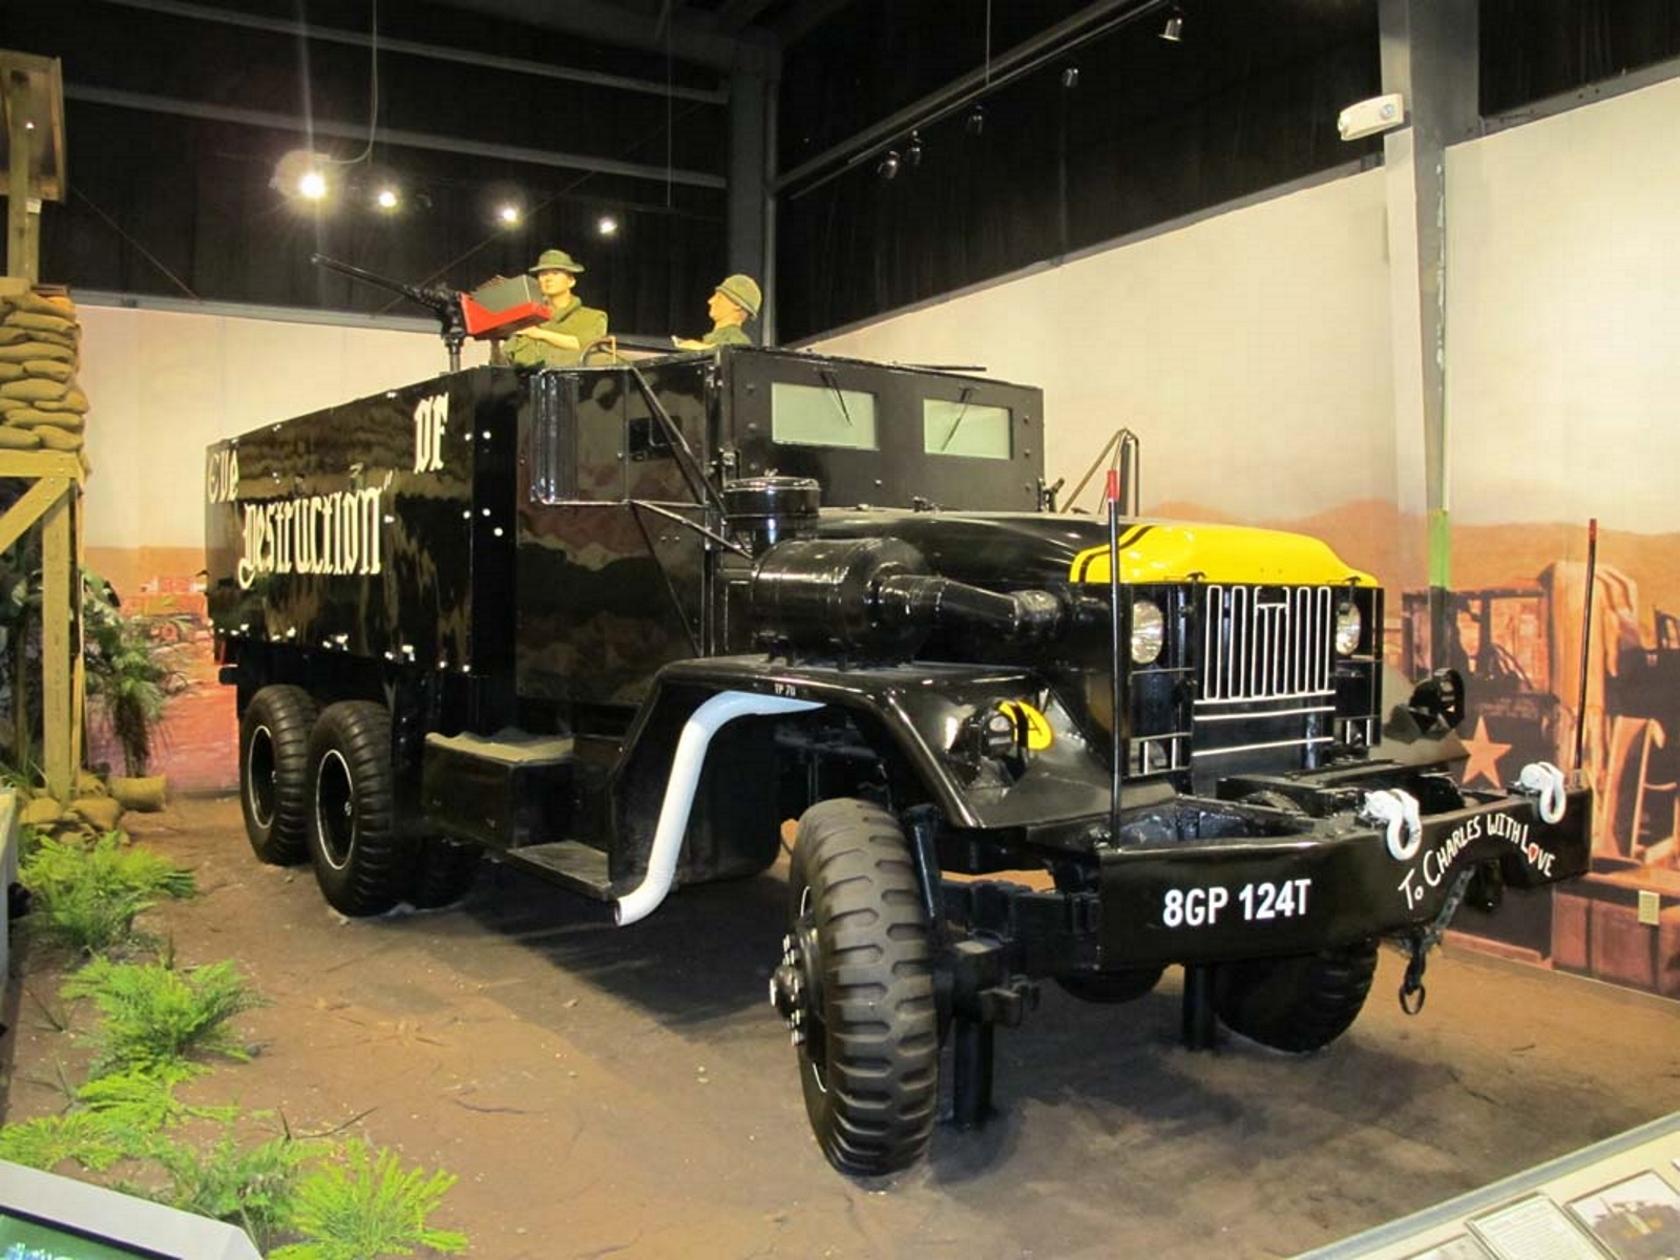 M54 Guntruck